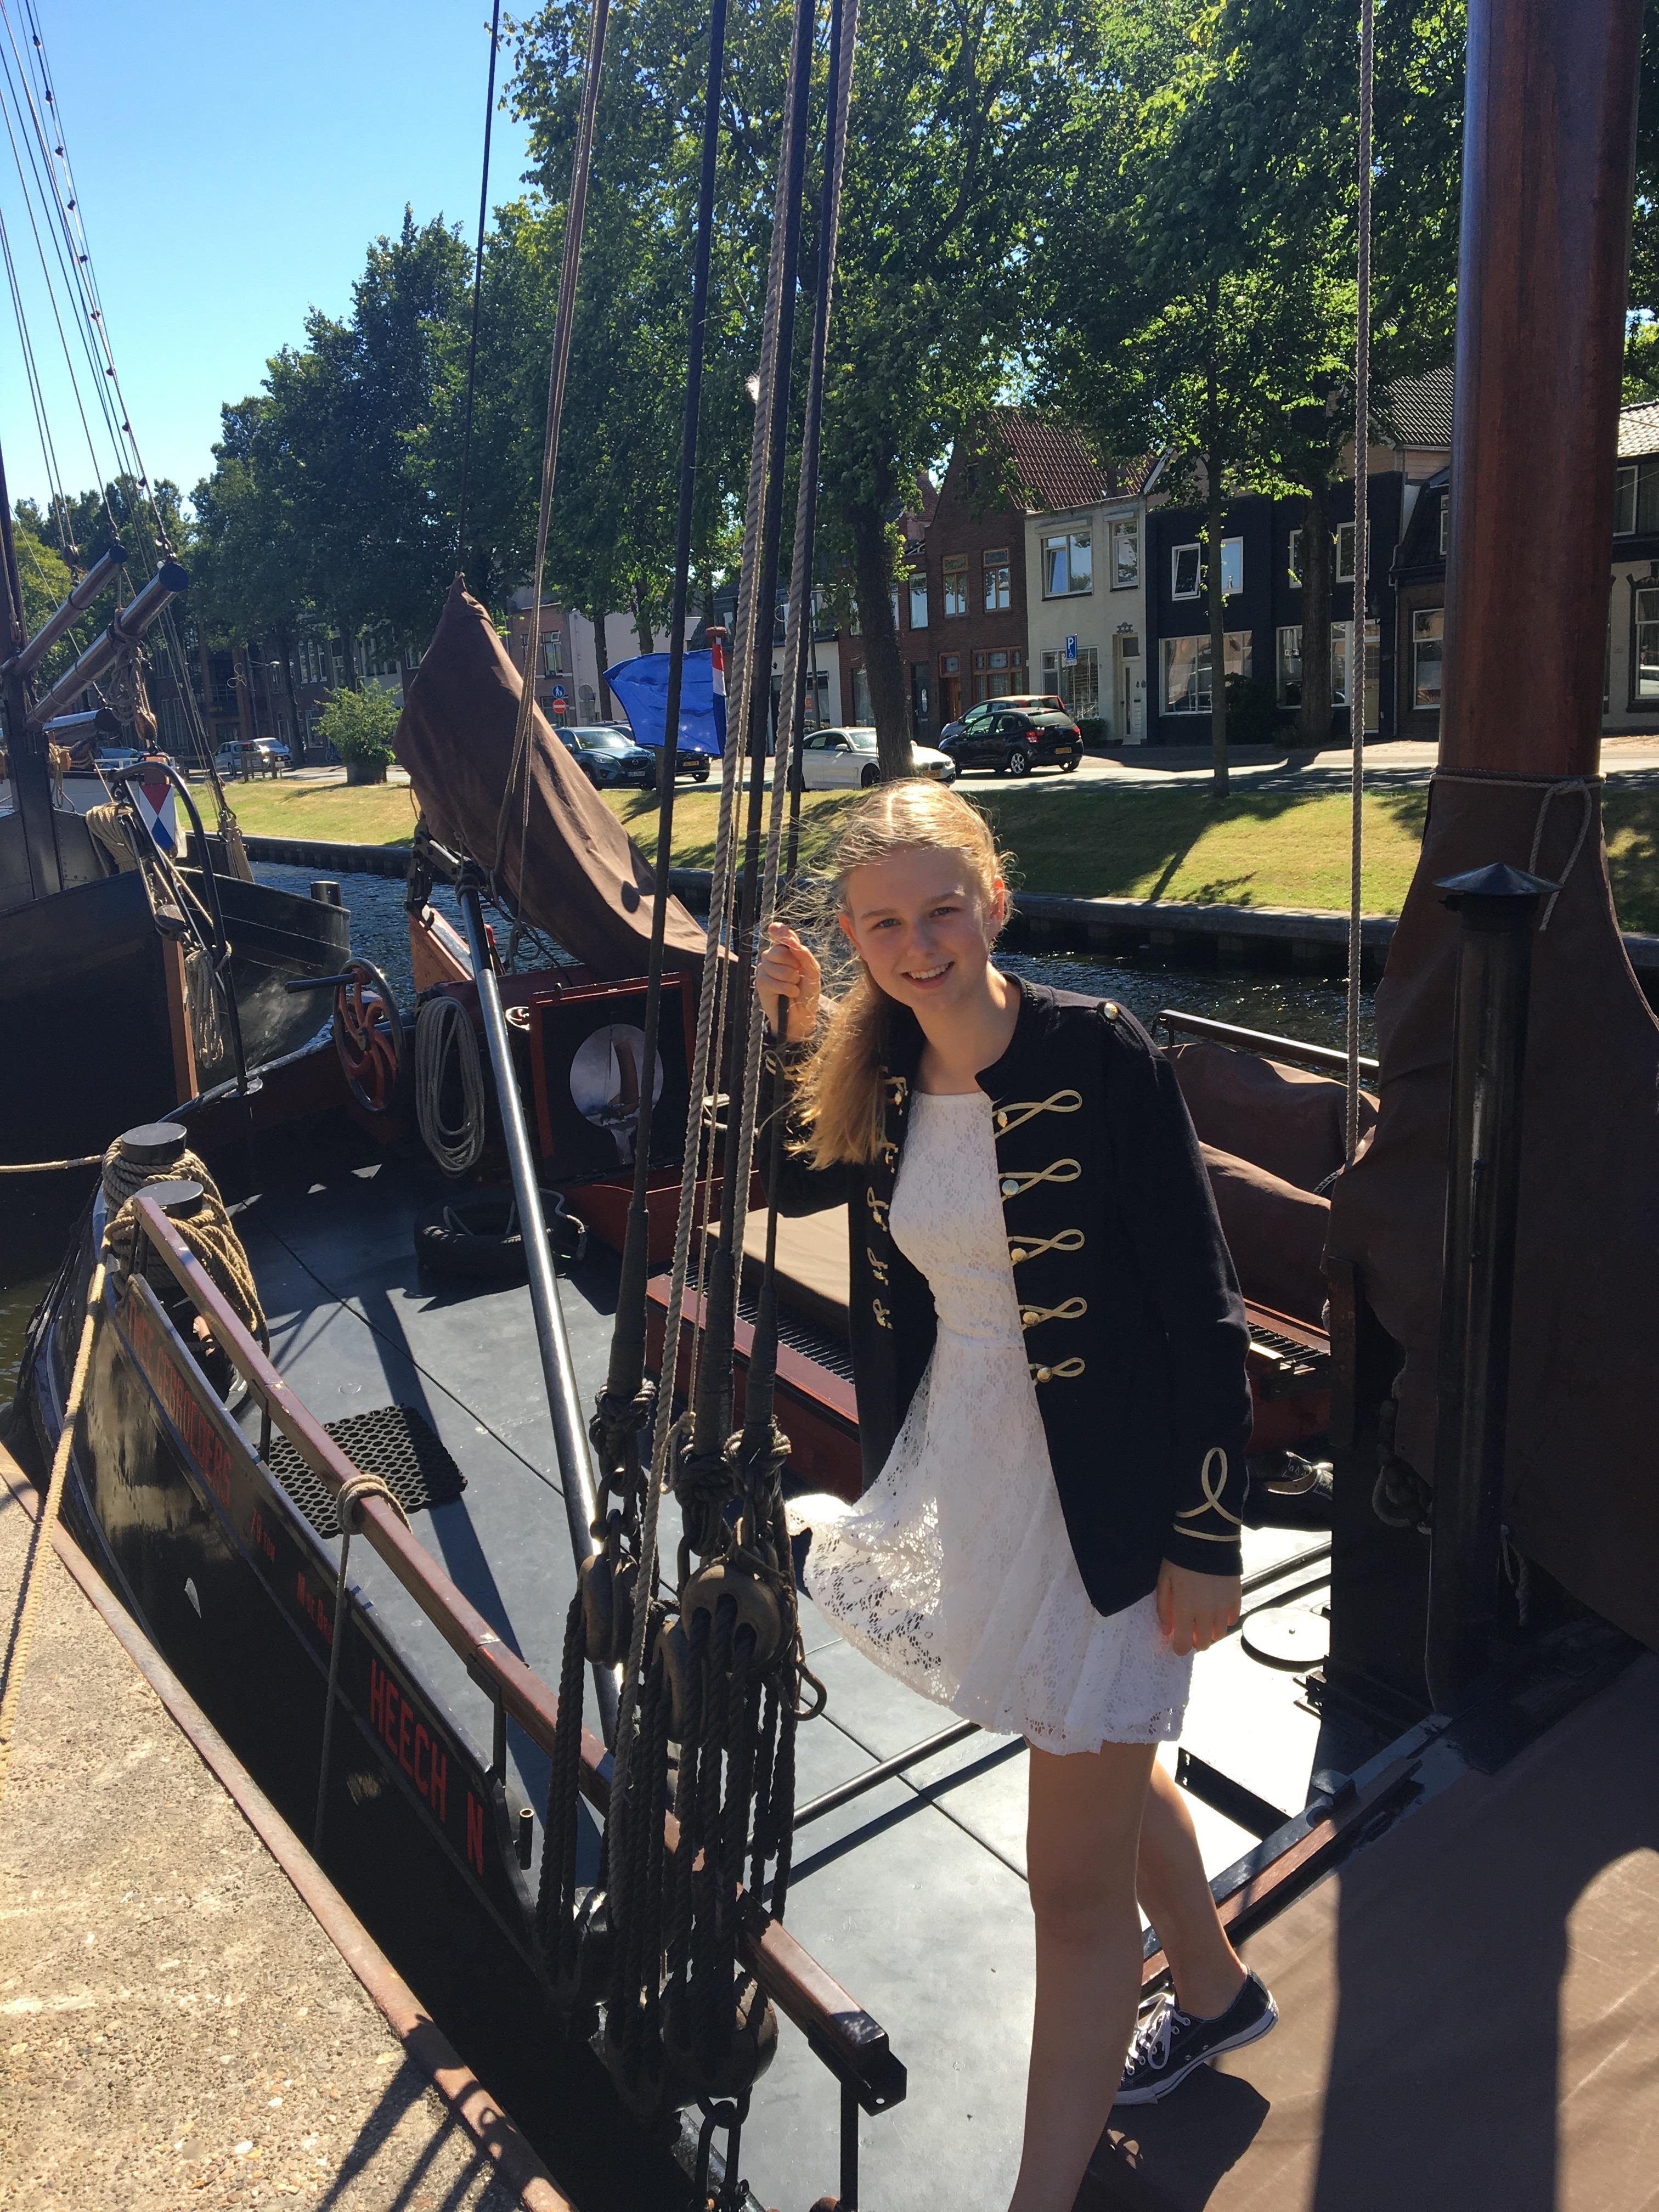 Dide de Vries wil dolgraag mee met 'School at Sea'. (Foto: Familie De Vries)